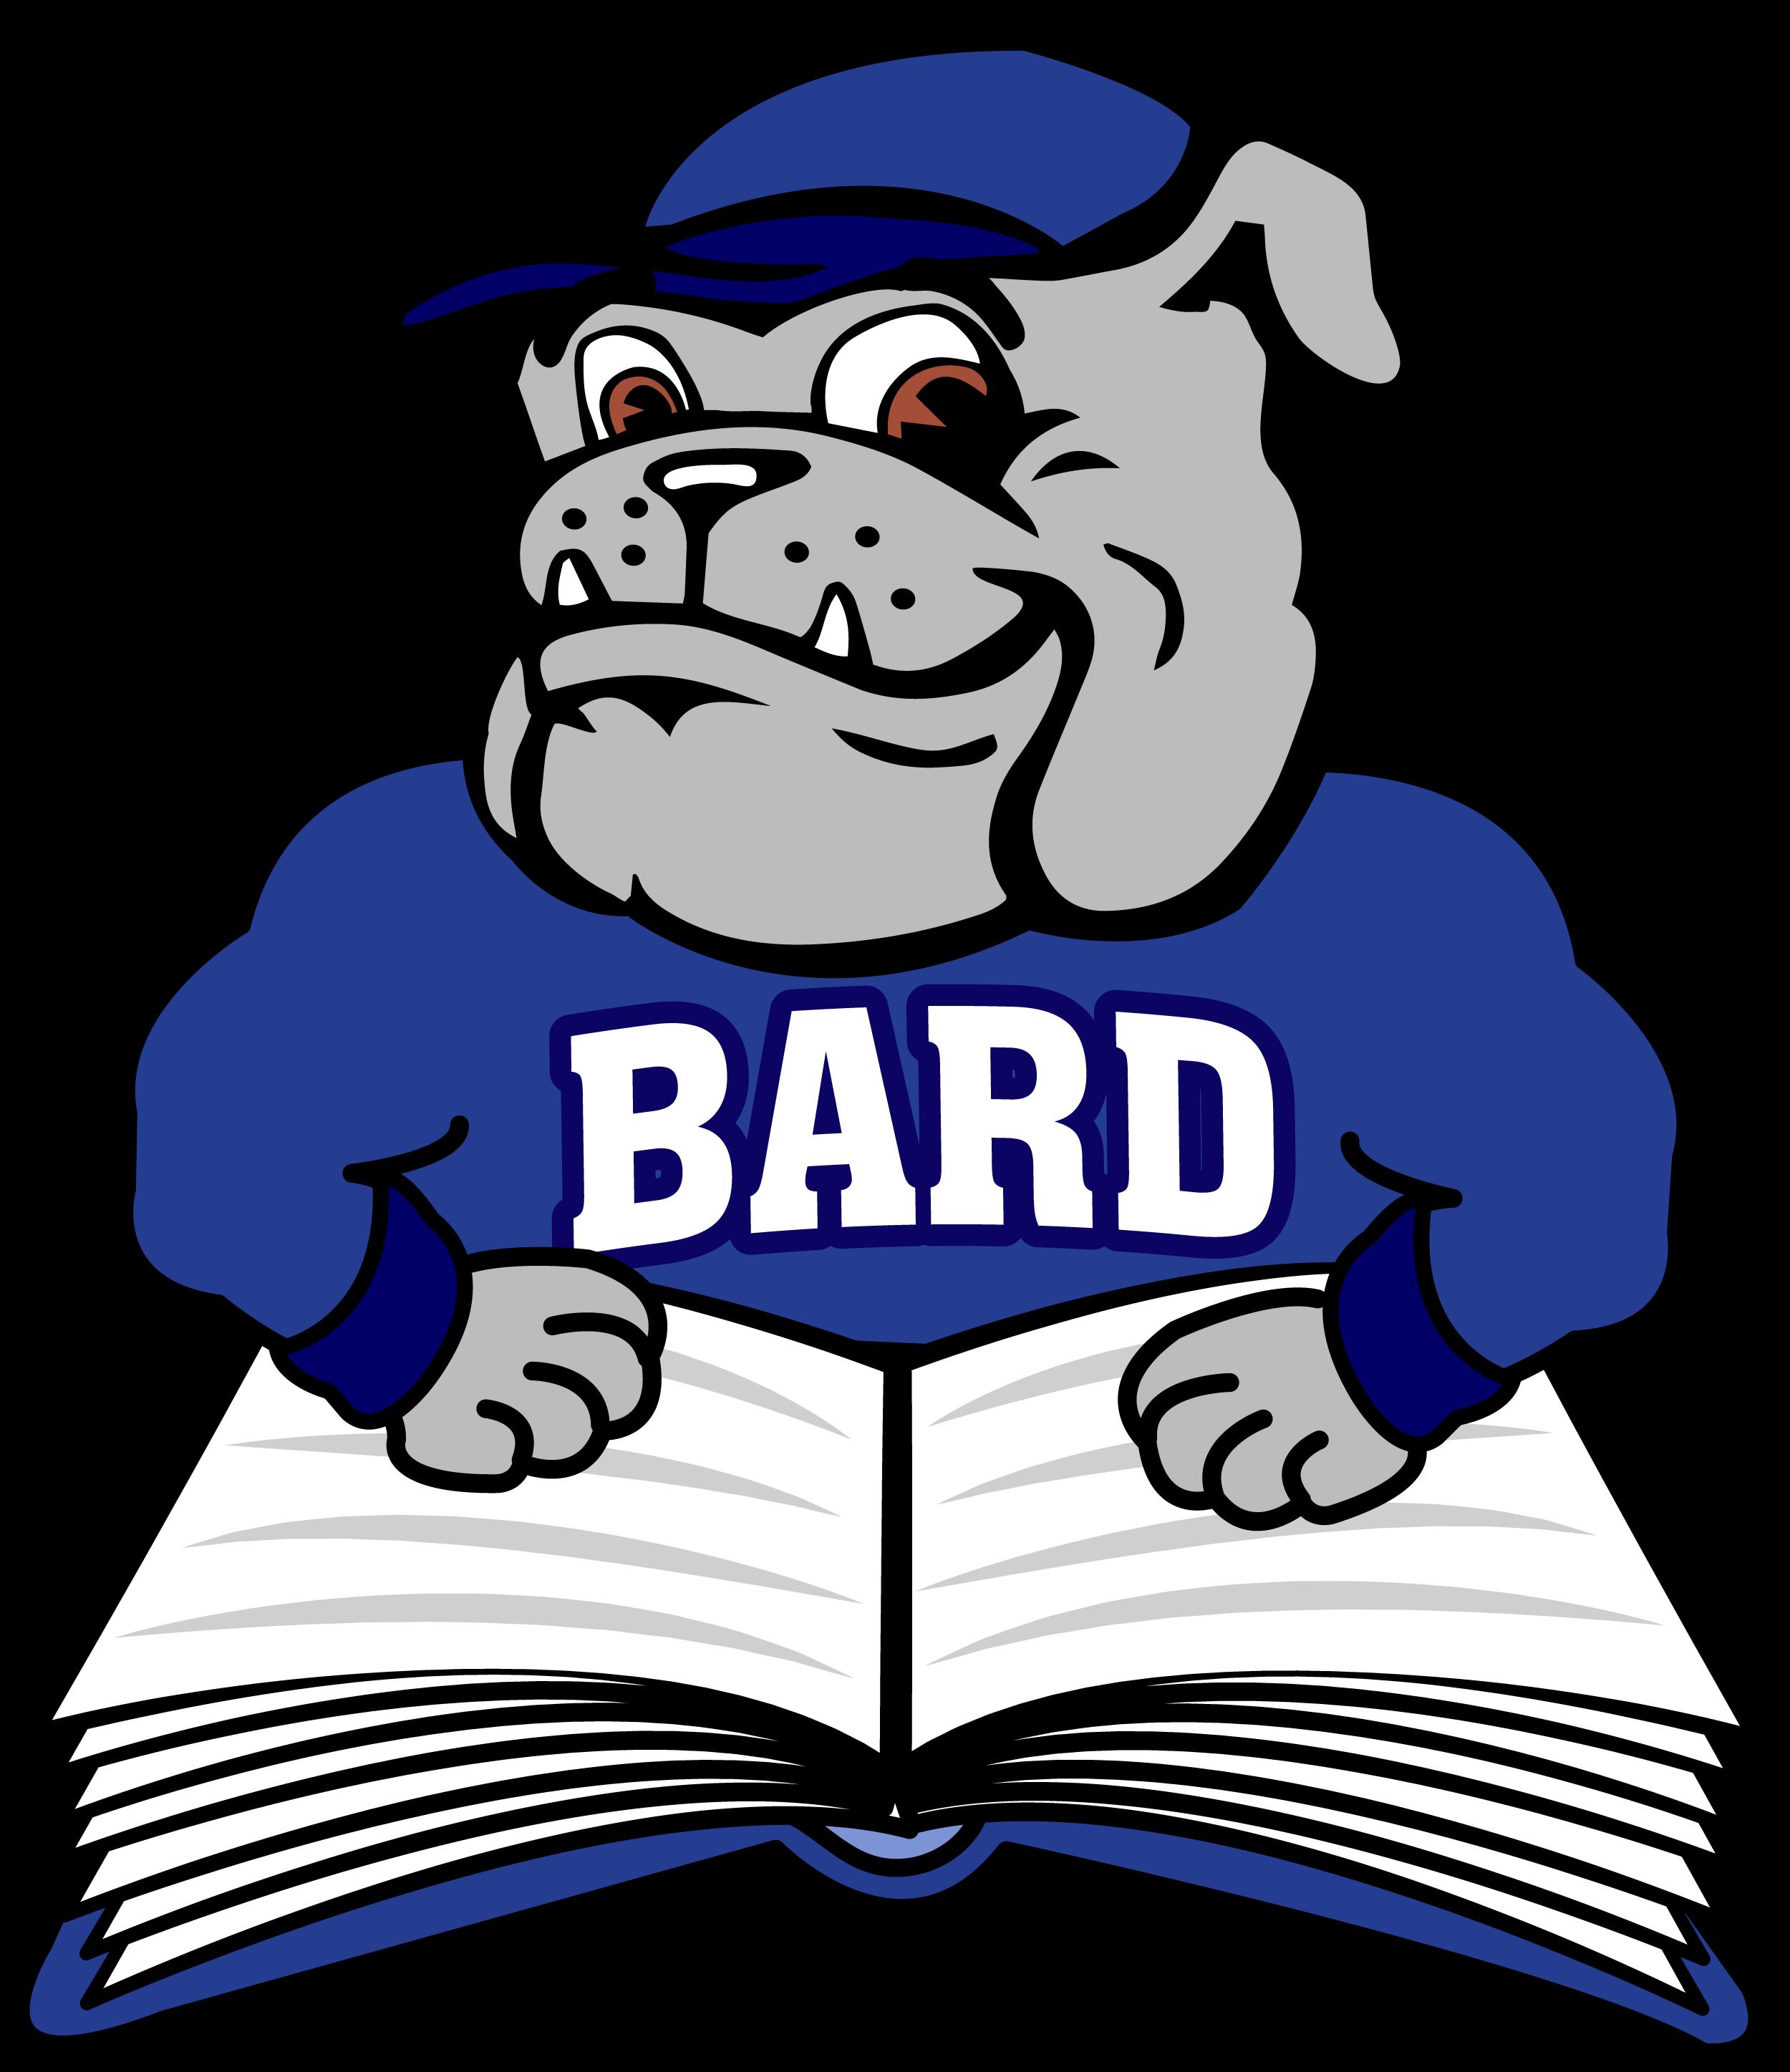 Bard Elementary